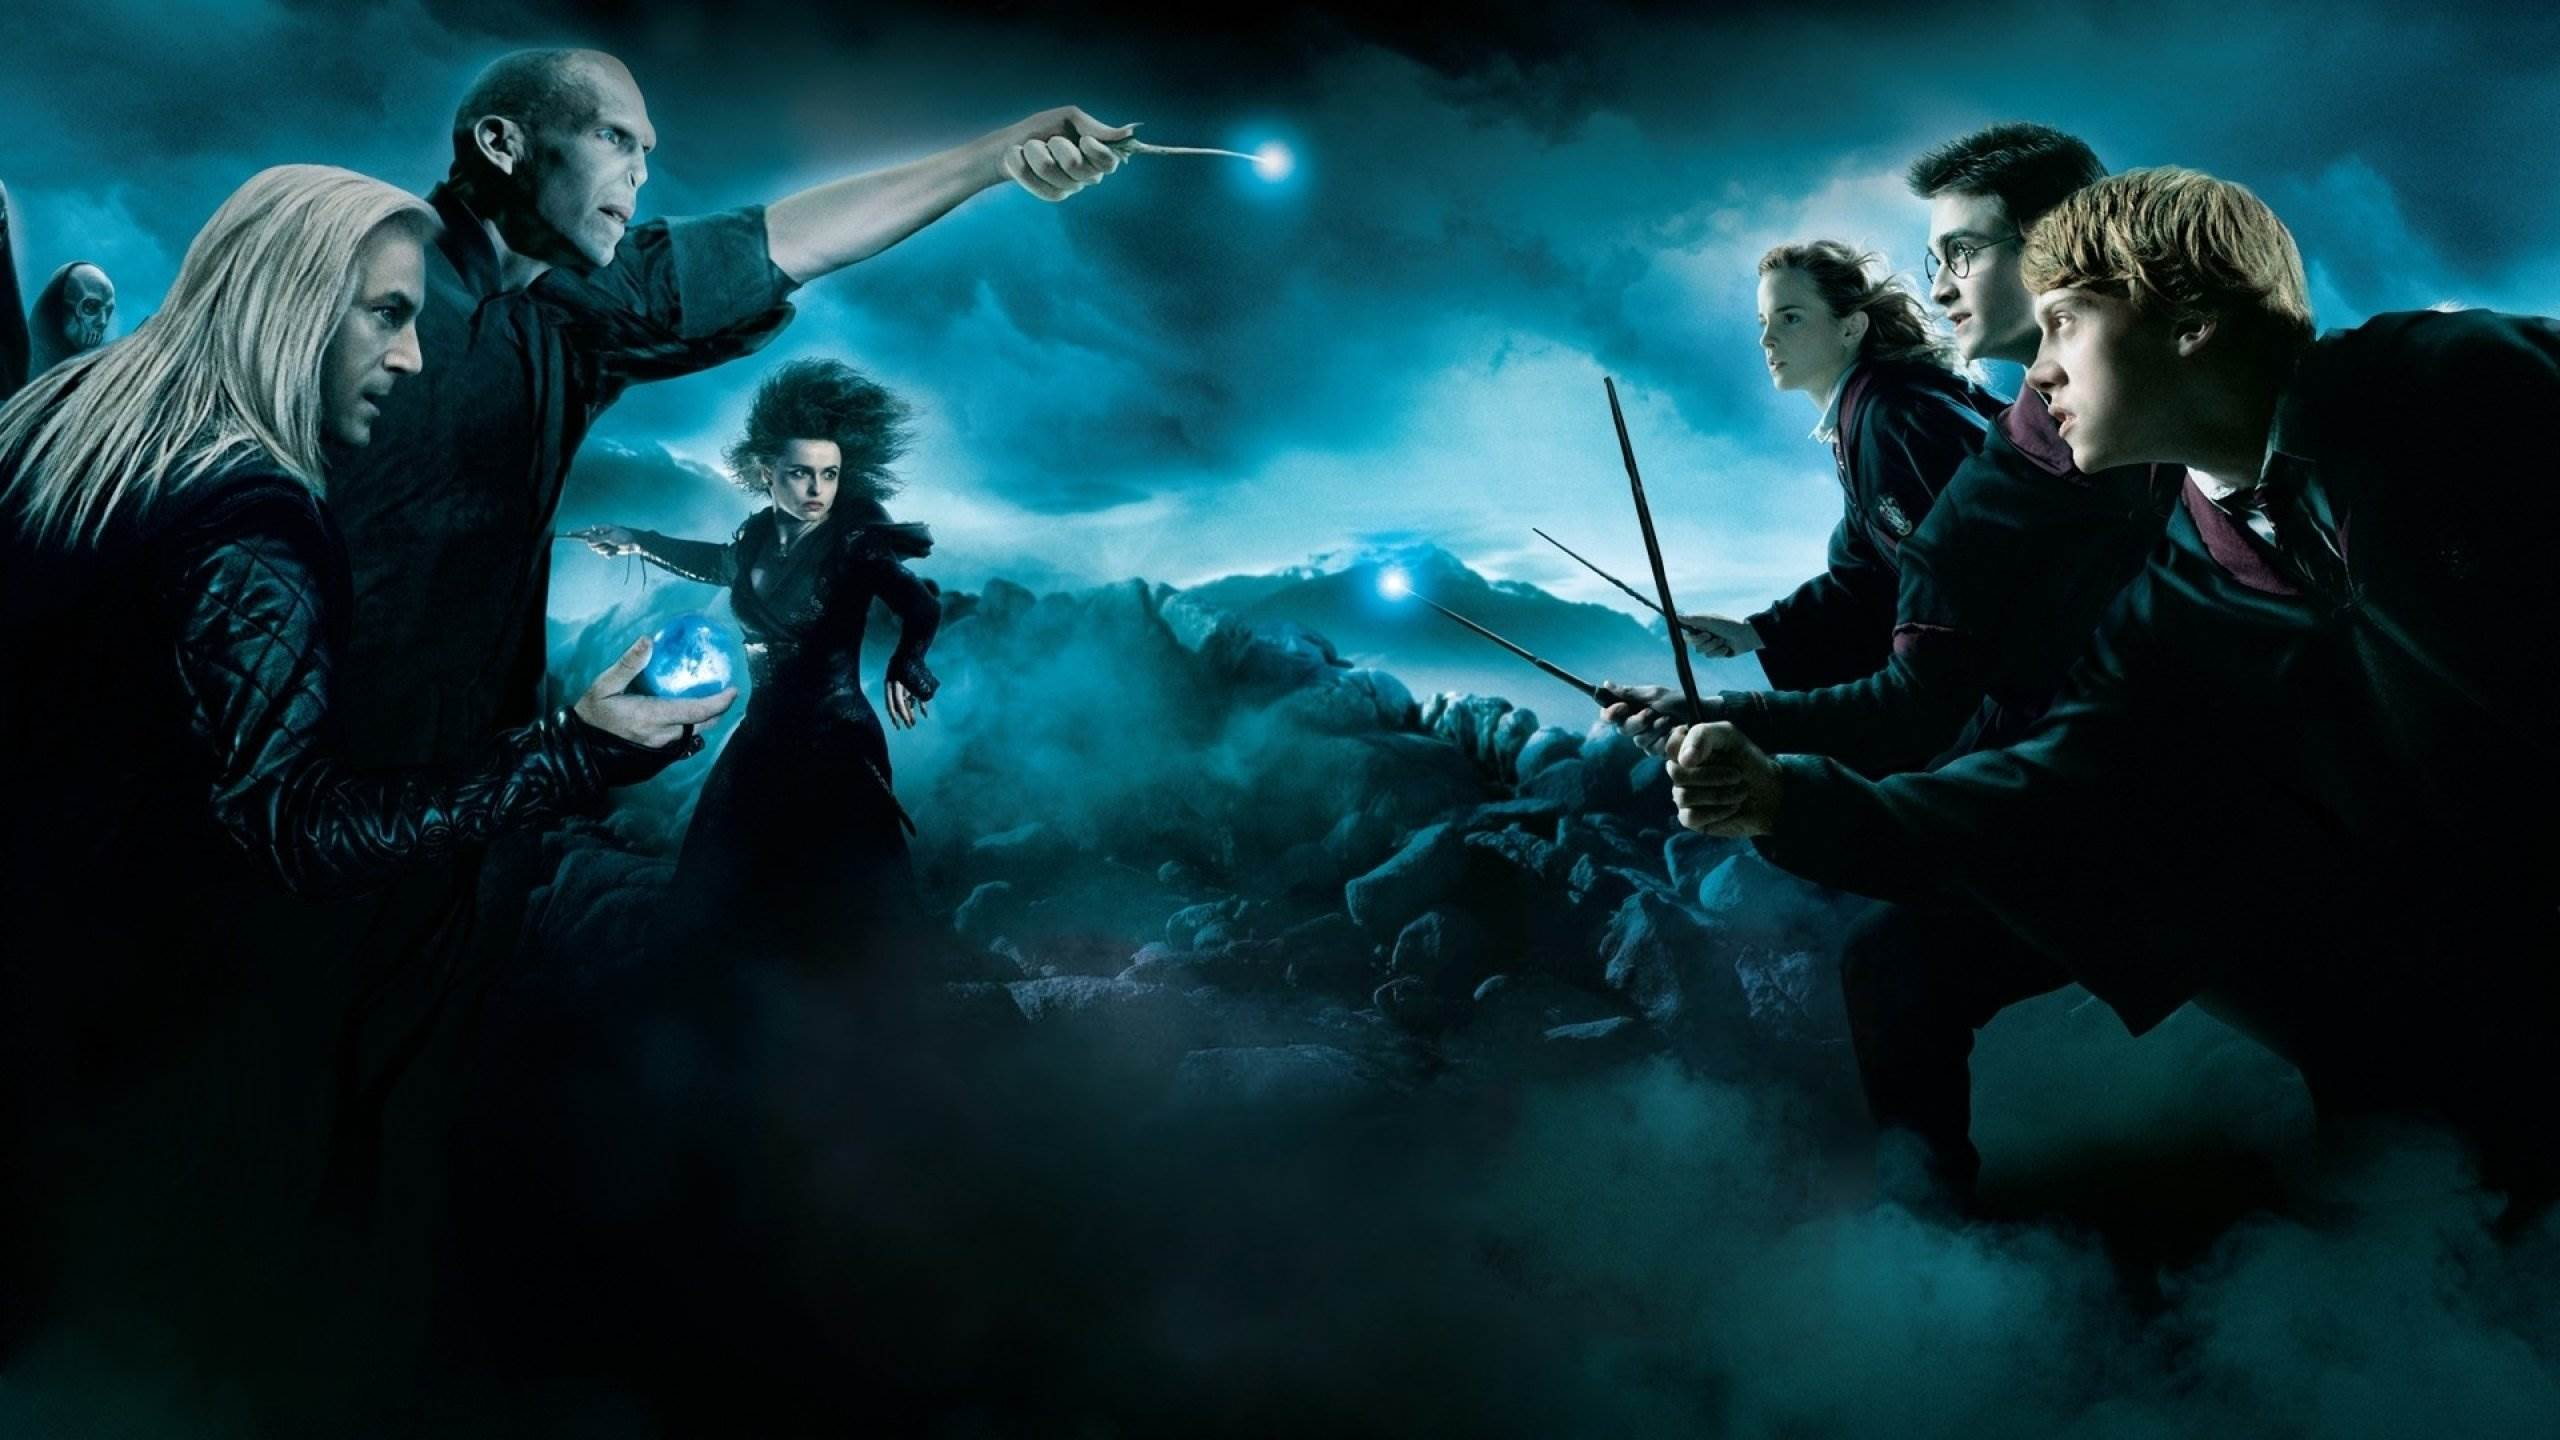 Harry Potter Wallpapers Full HD for Desktop Background For